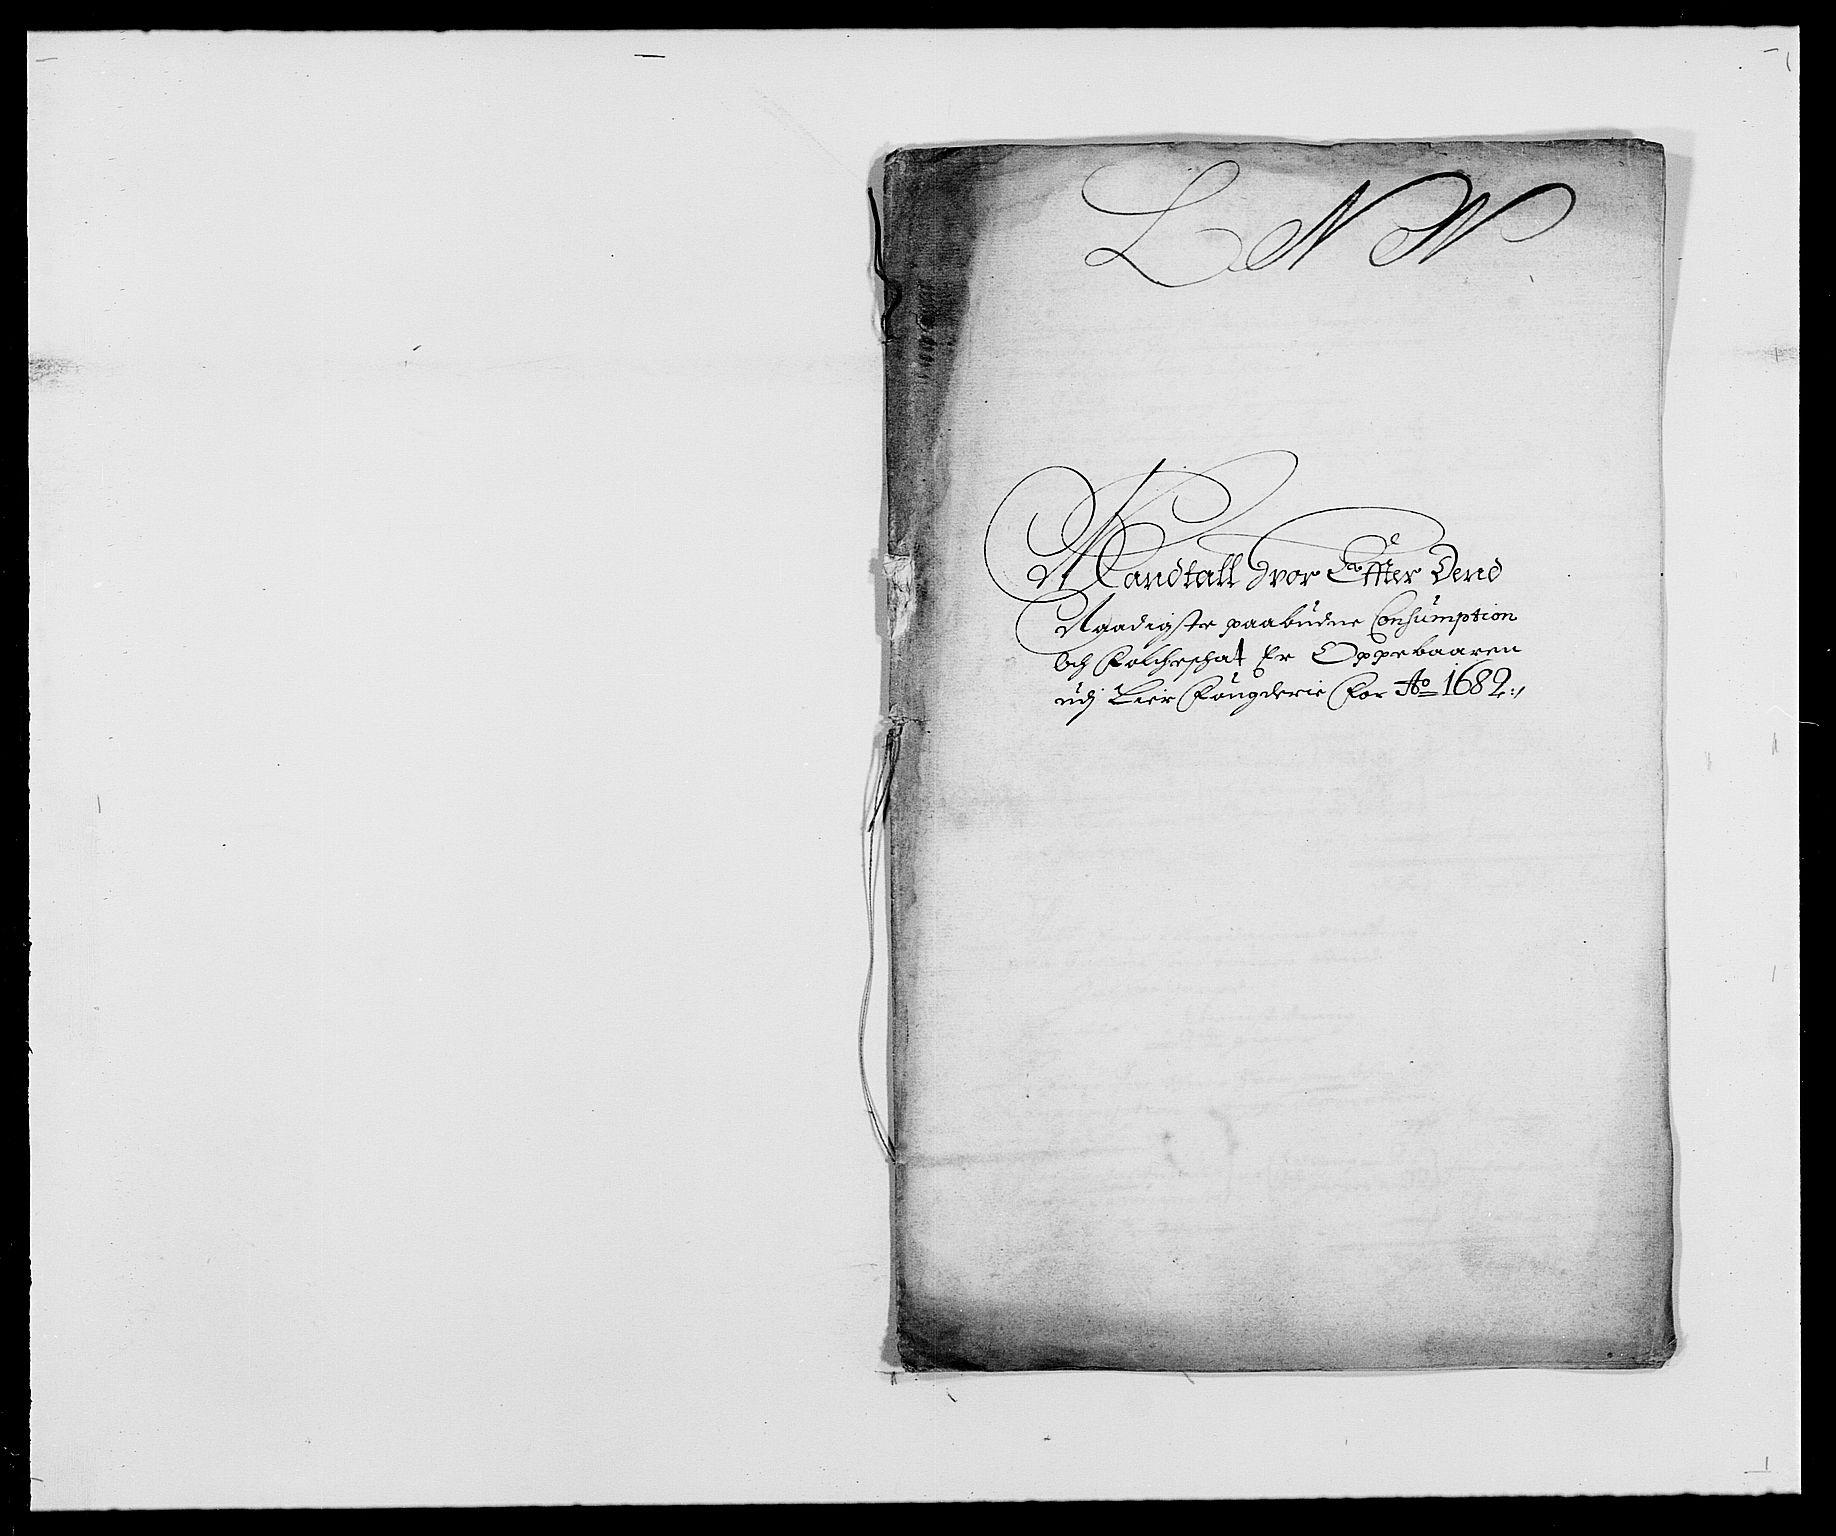 RA, Rentekammeret inntil 1814, Reviderte regnskaper, Fogderegnskap, R27/L1686: Fogderegnskap Lier, 1678-1686, s. 423